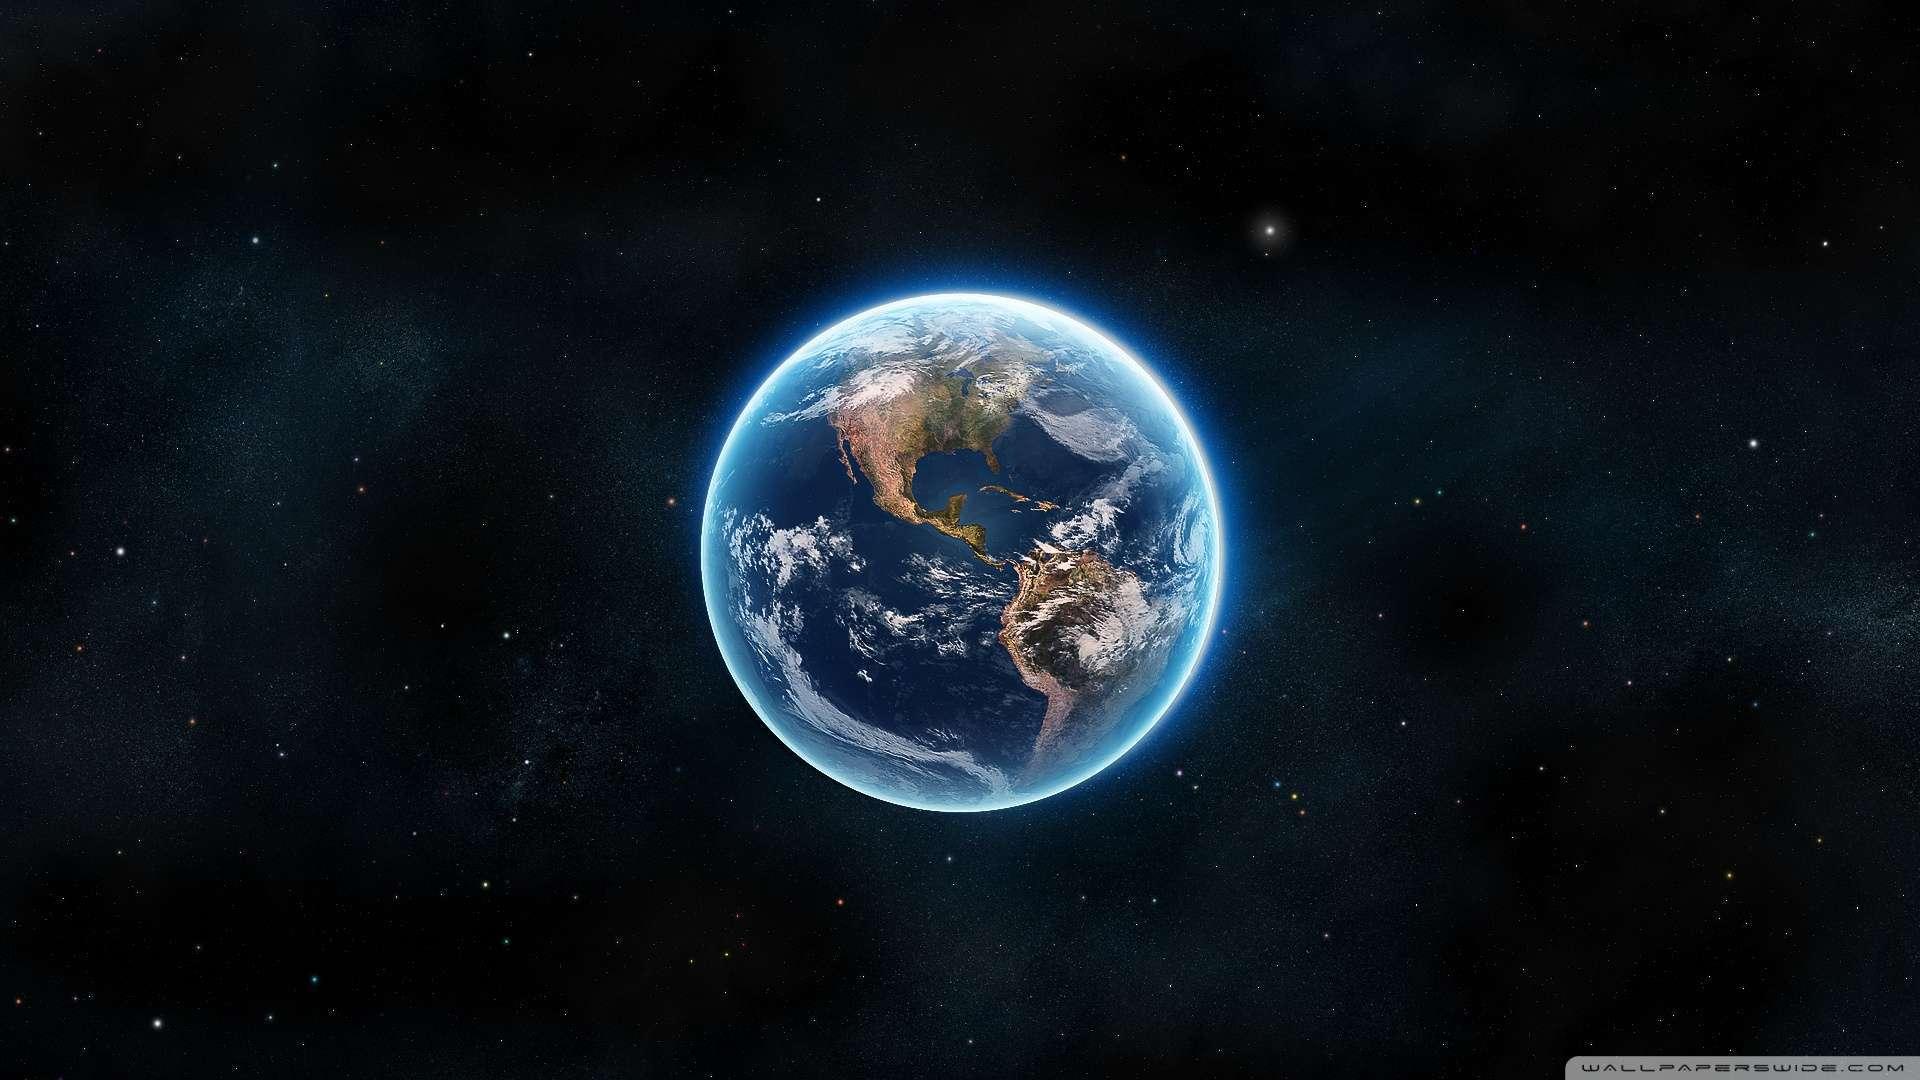 earth wallpaper hd 1080p on wallpapersafari